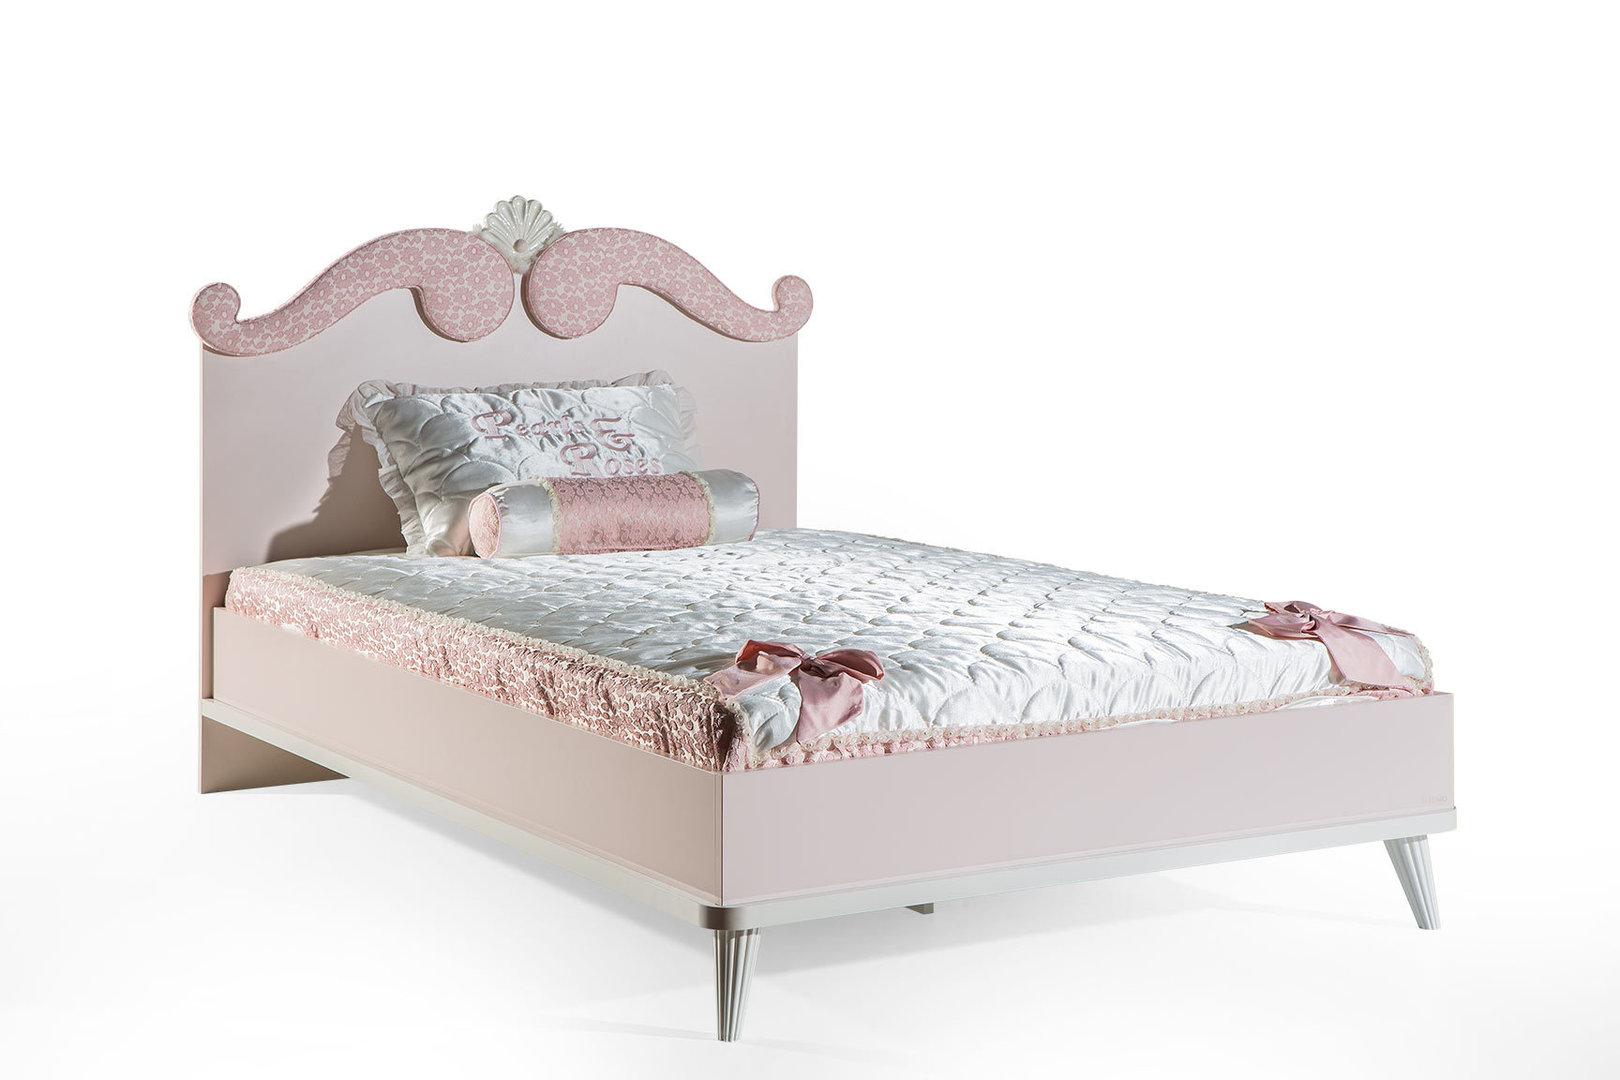 bymm kinderbett rosa in altrosa 120 x 200 frei haus precogs. Black Bedroom Furniture Sets. Home Design Ideas